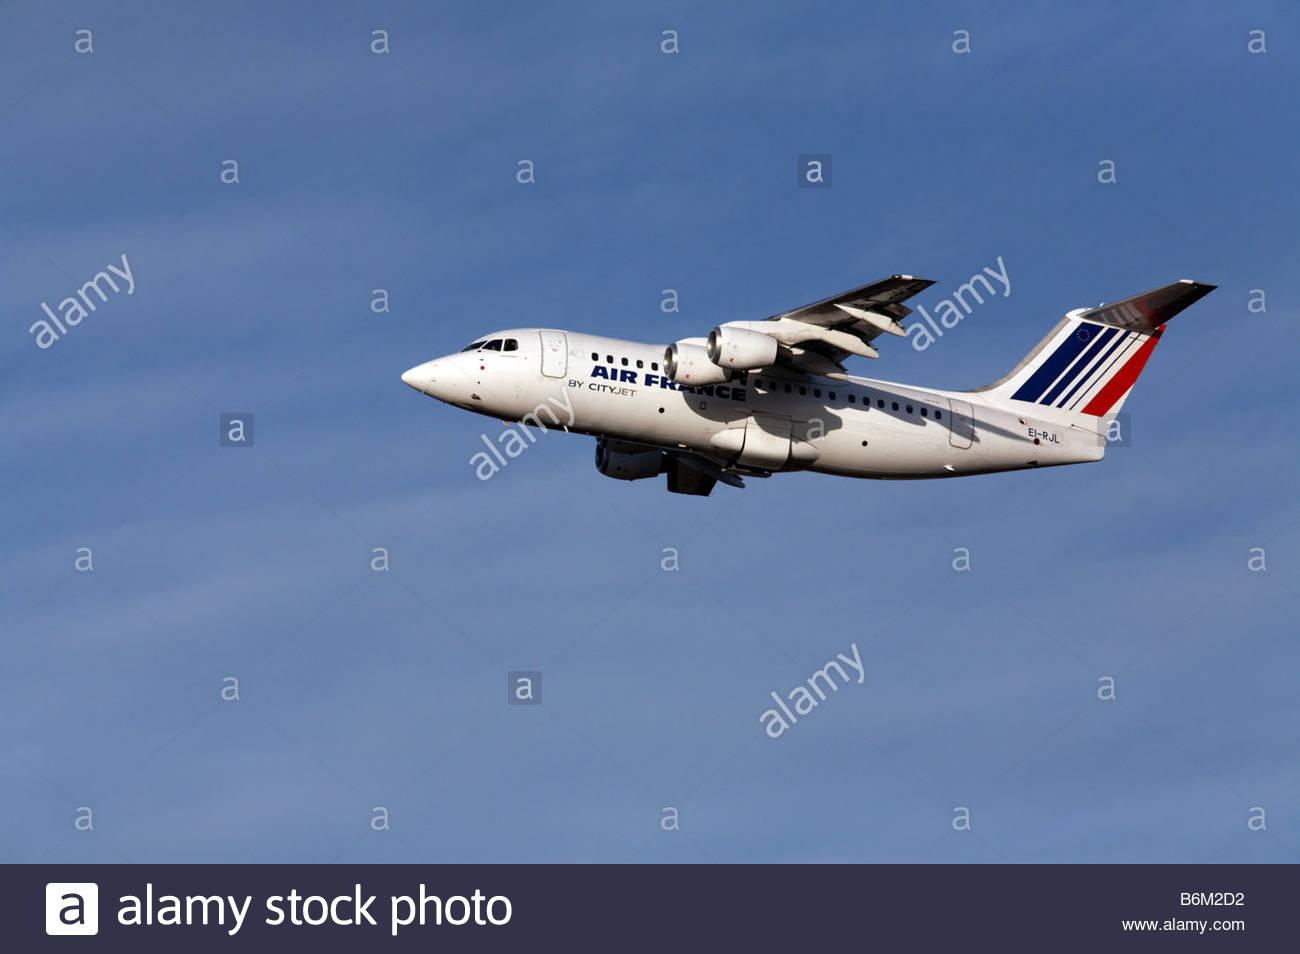 Cityjet flight shortly after takeoff - Stock Image